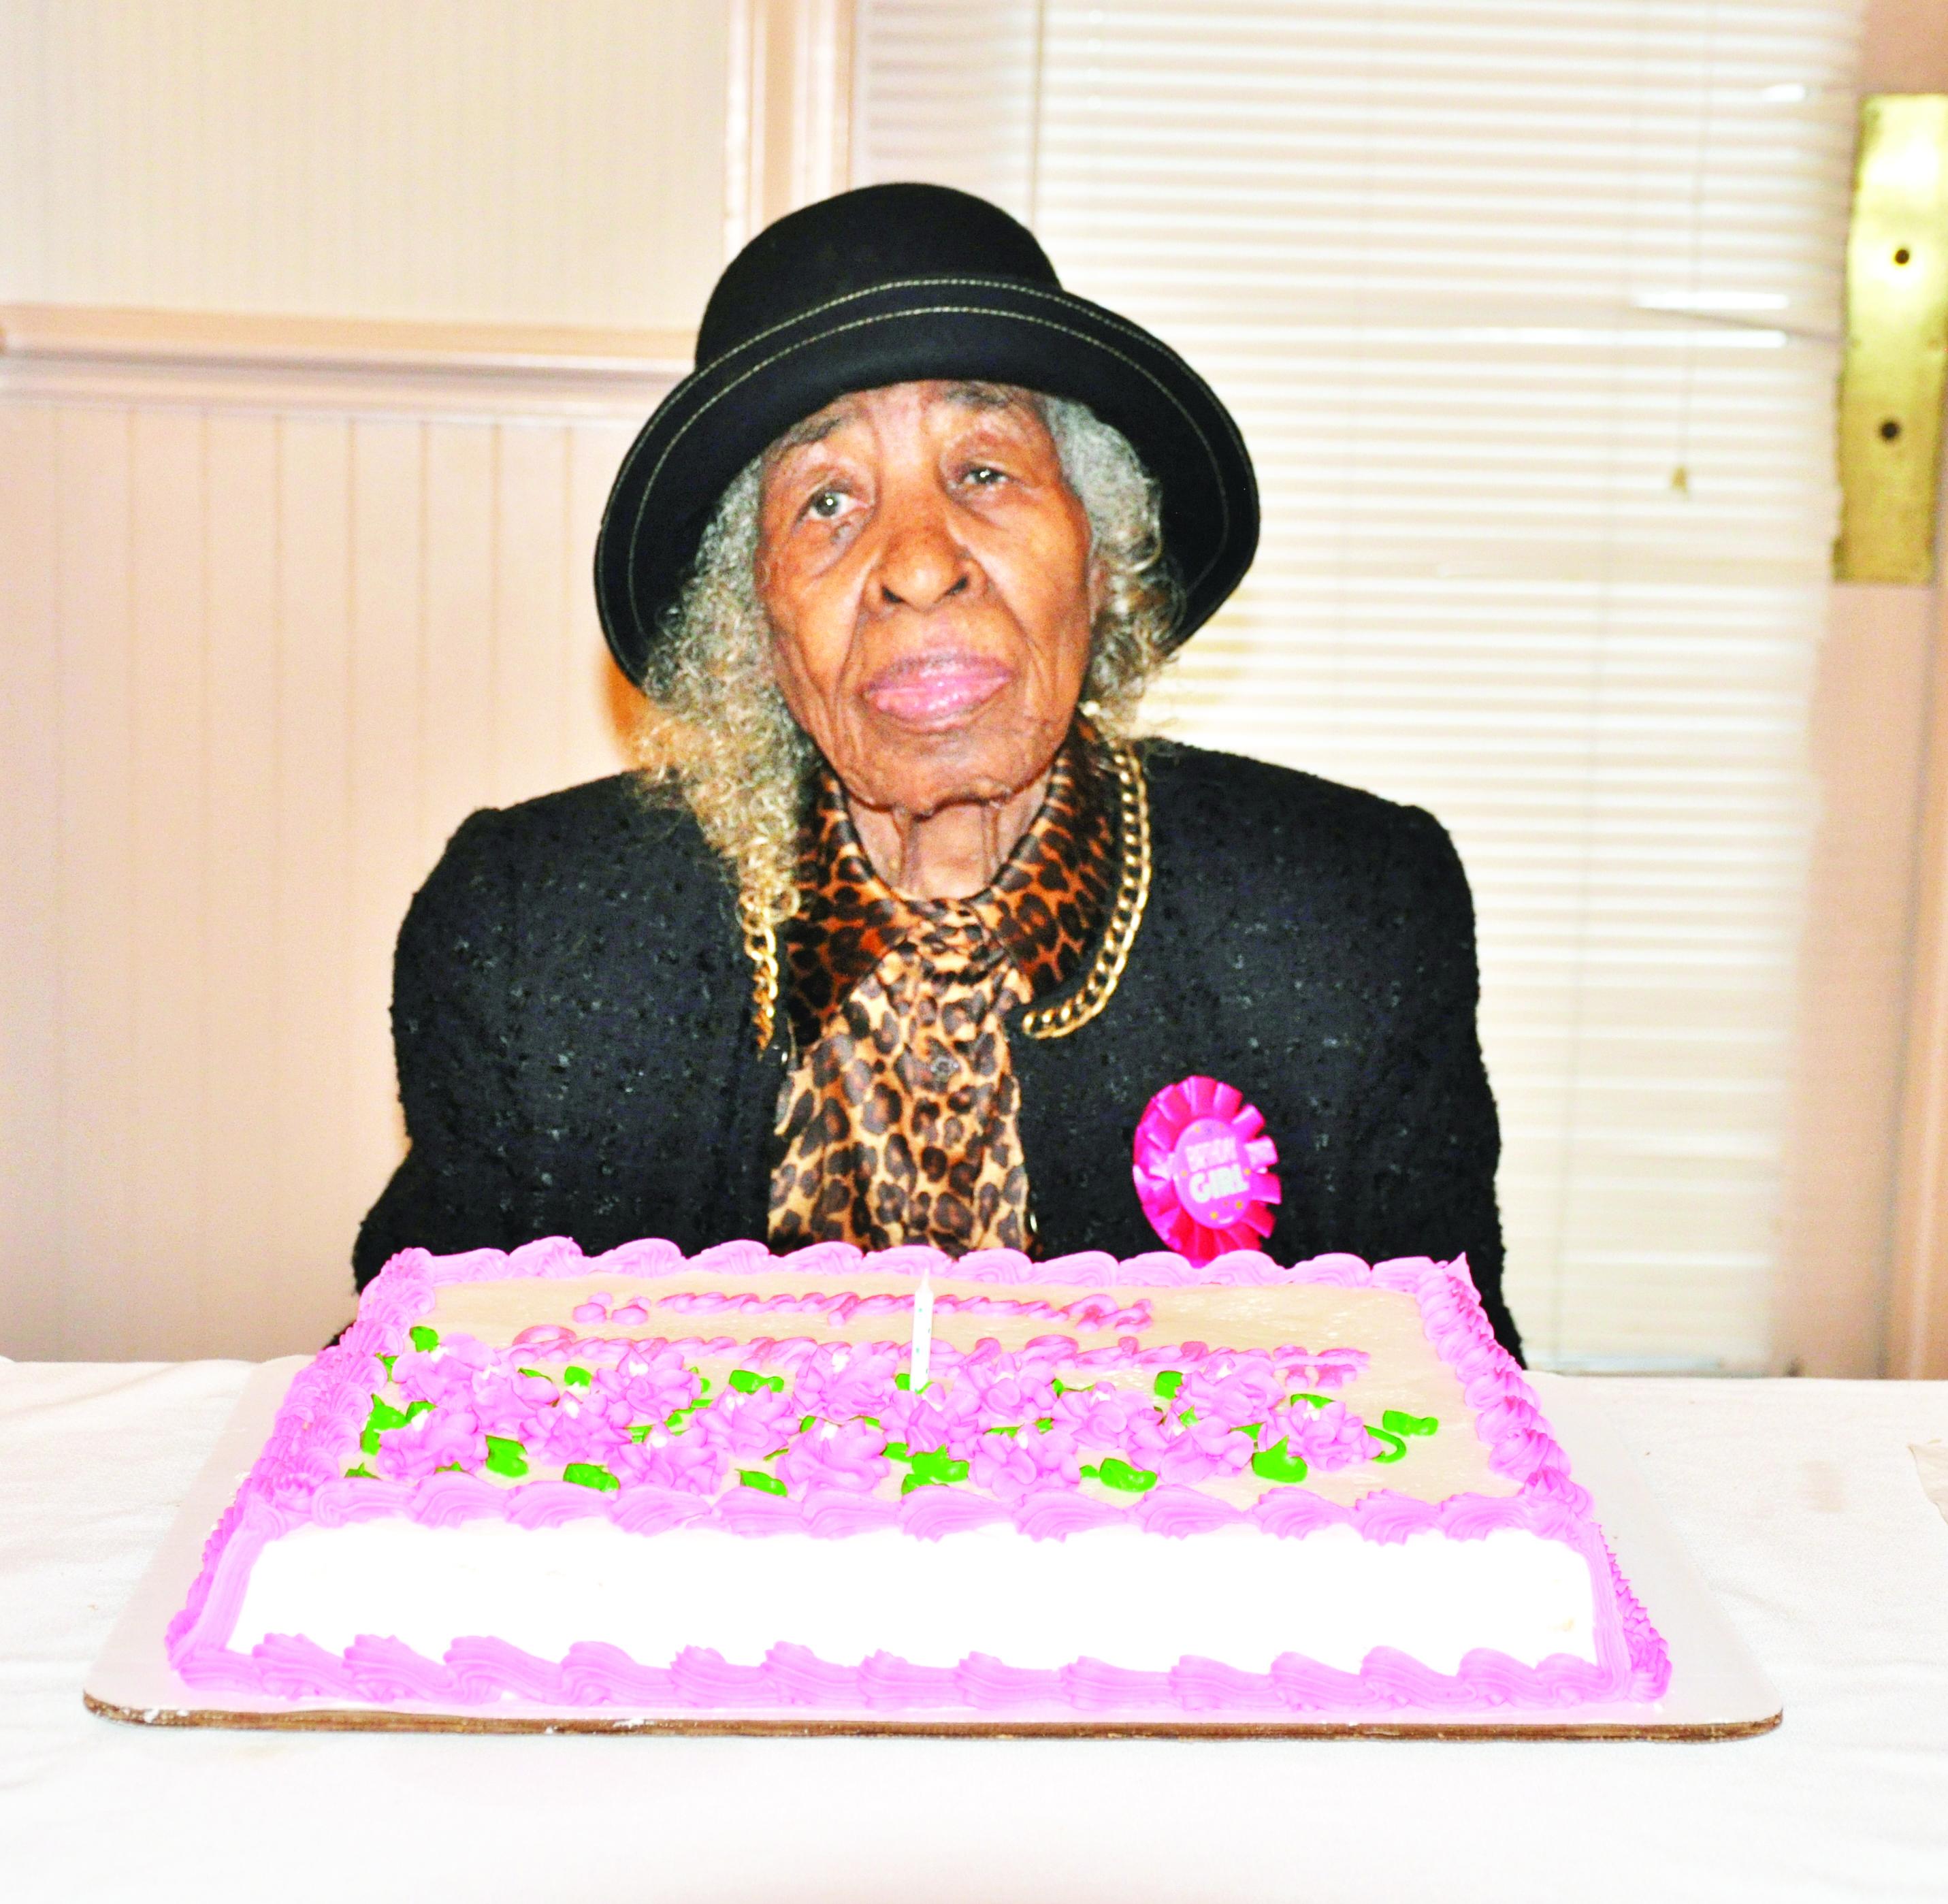 ANNIE S GREGORY CELEBRATES 100TH BIRTHDAY